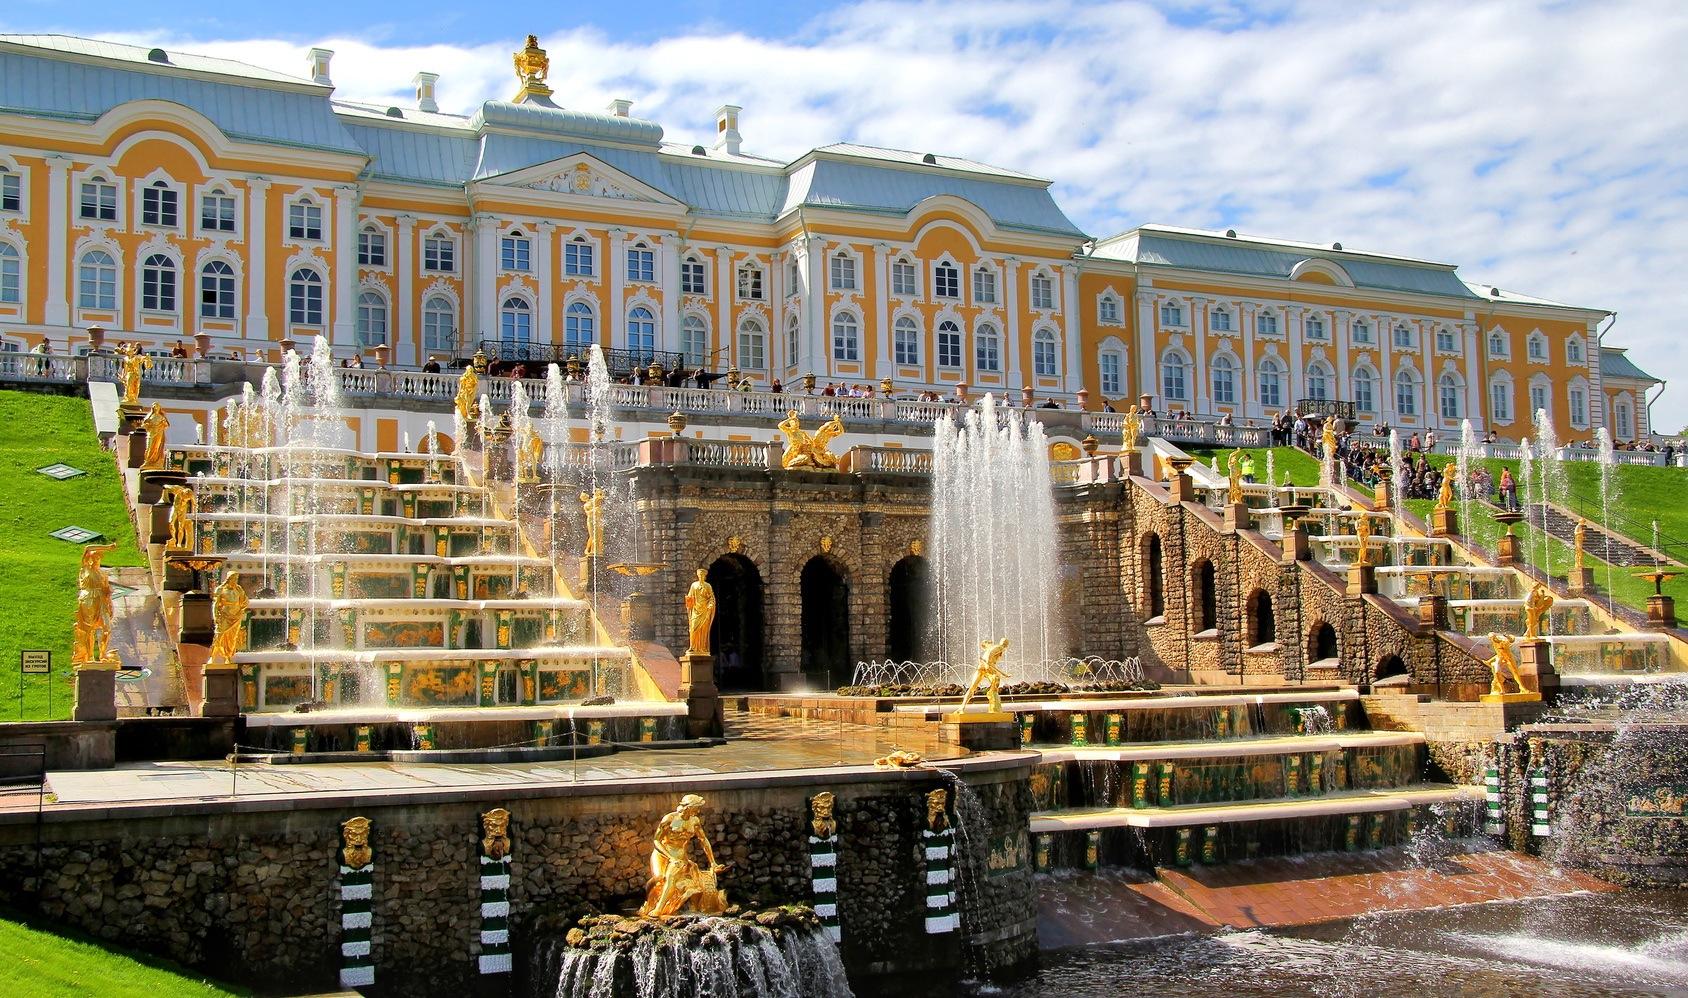 Finland Russia Tour The Czar Route Tour Of Helsinki